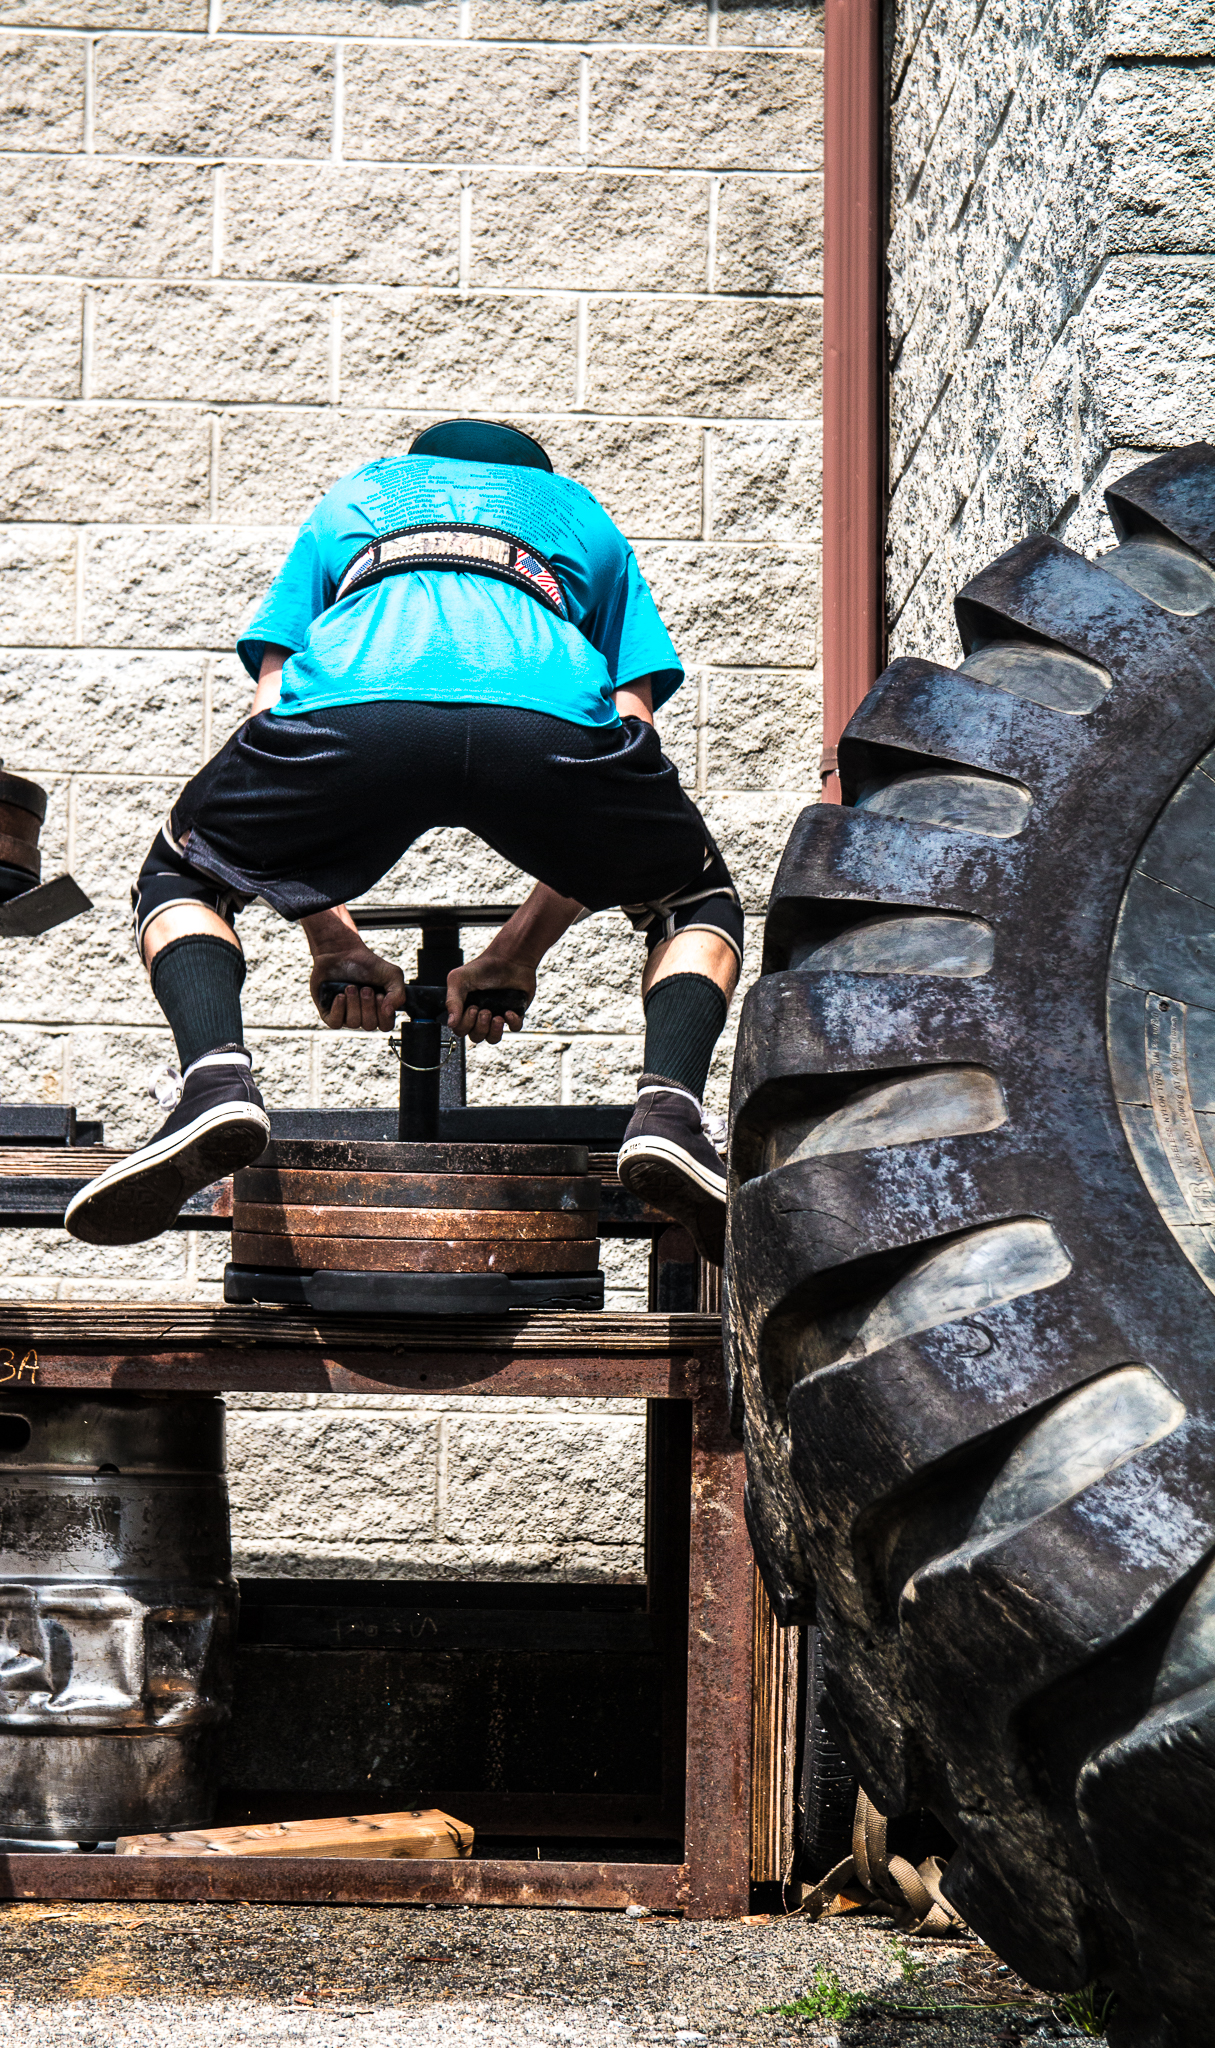 hurt-performance-4th-annual-little-viking-charity-washingtonville-new-york-strongman-eveyrdaylifters-vp (305 of 348).jpg